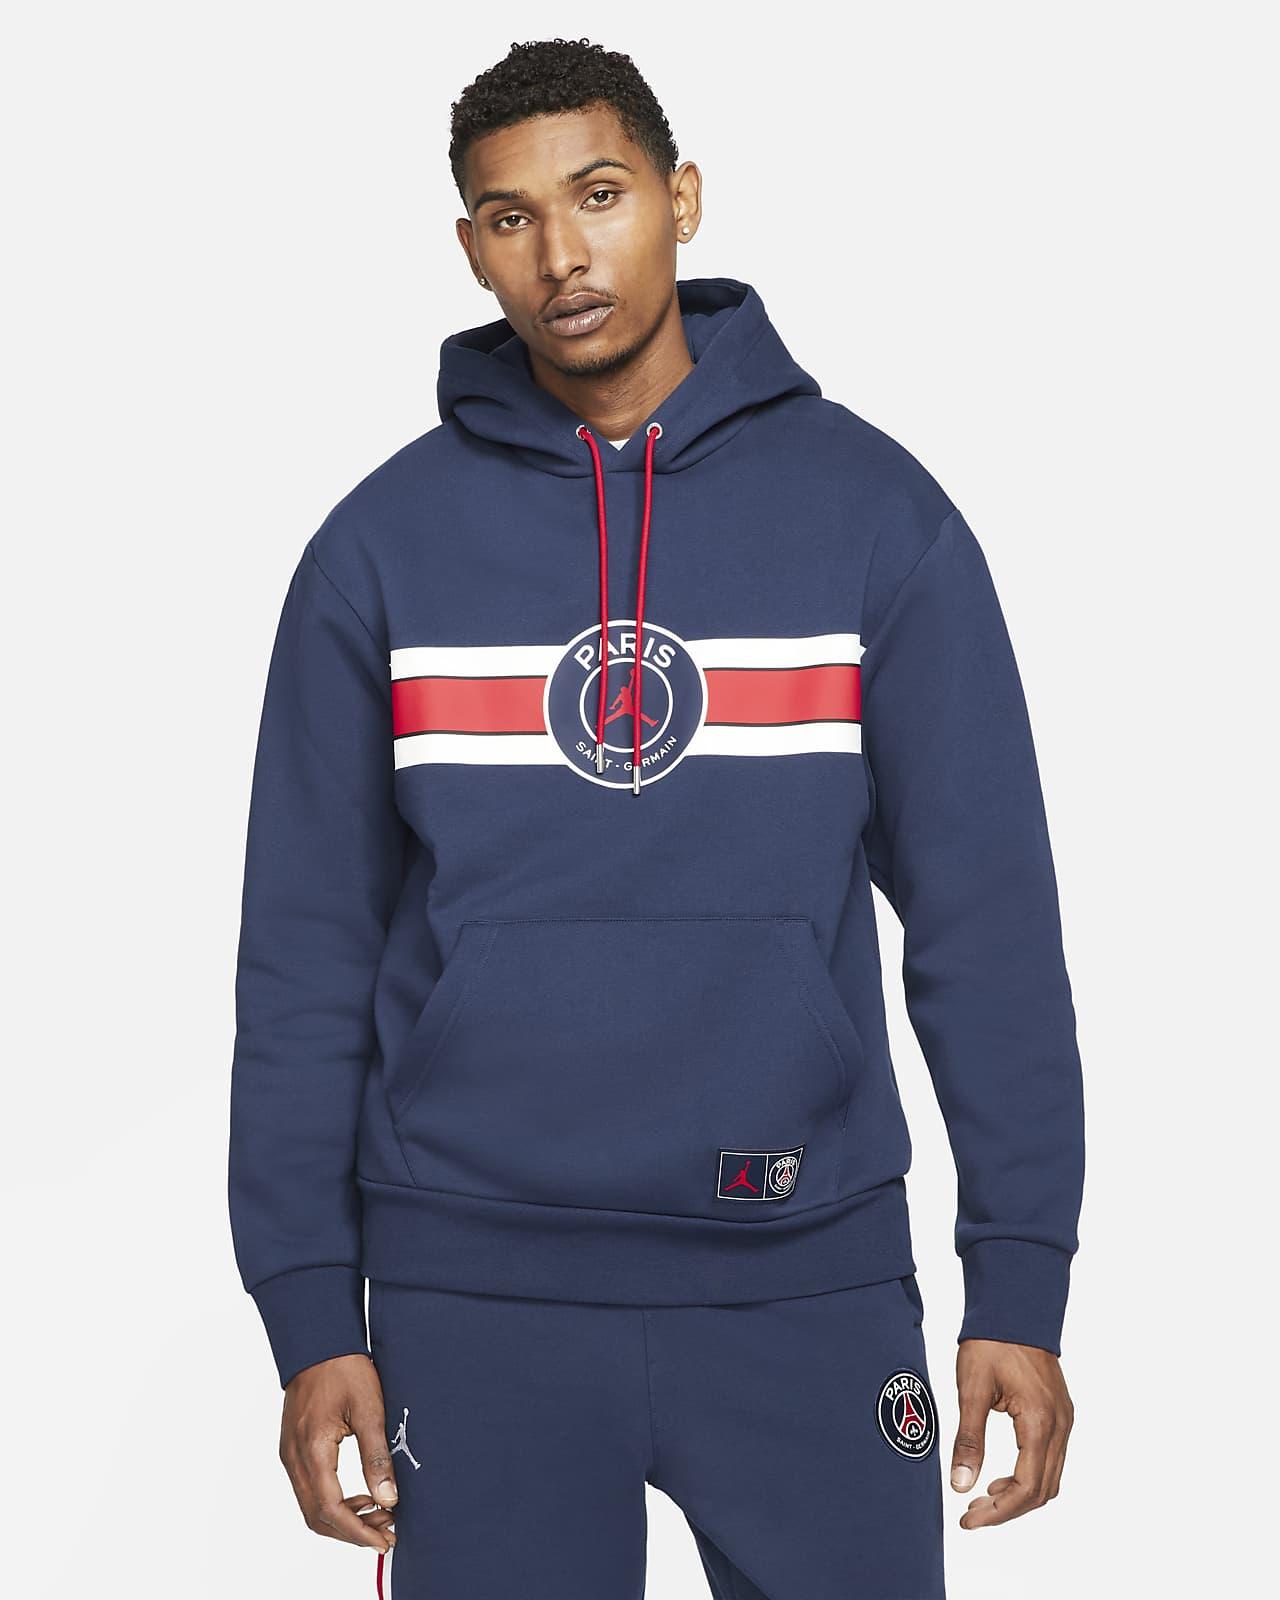 Paris Saint-Germain Men's Fleece Pullover Hoodie